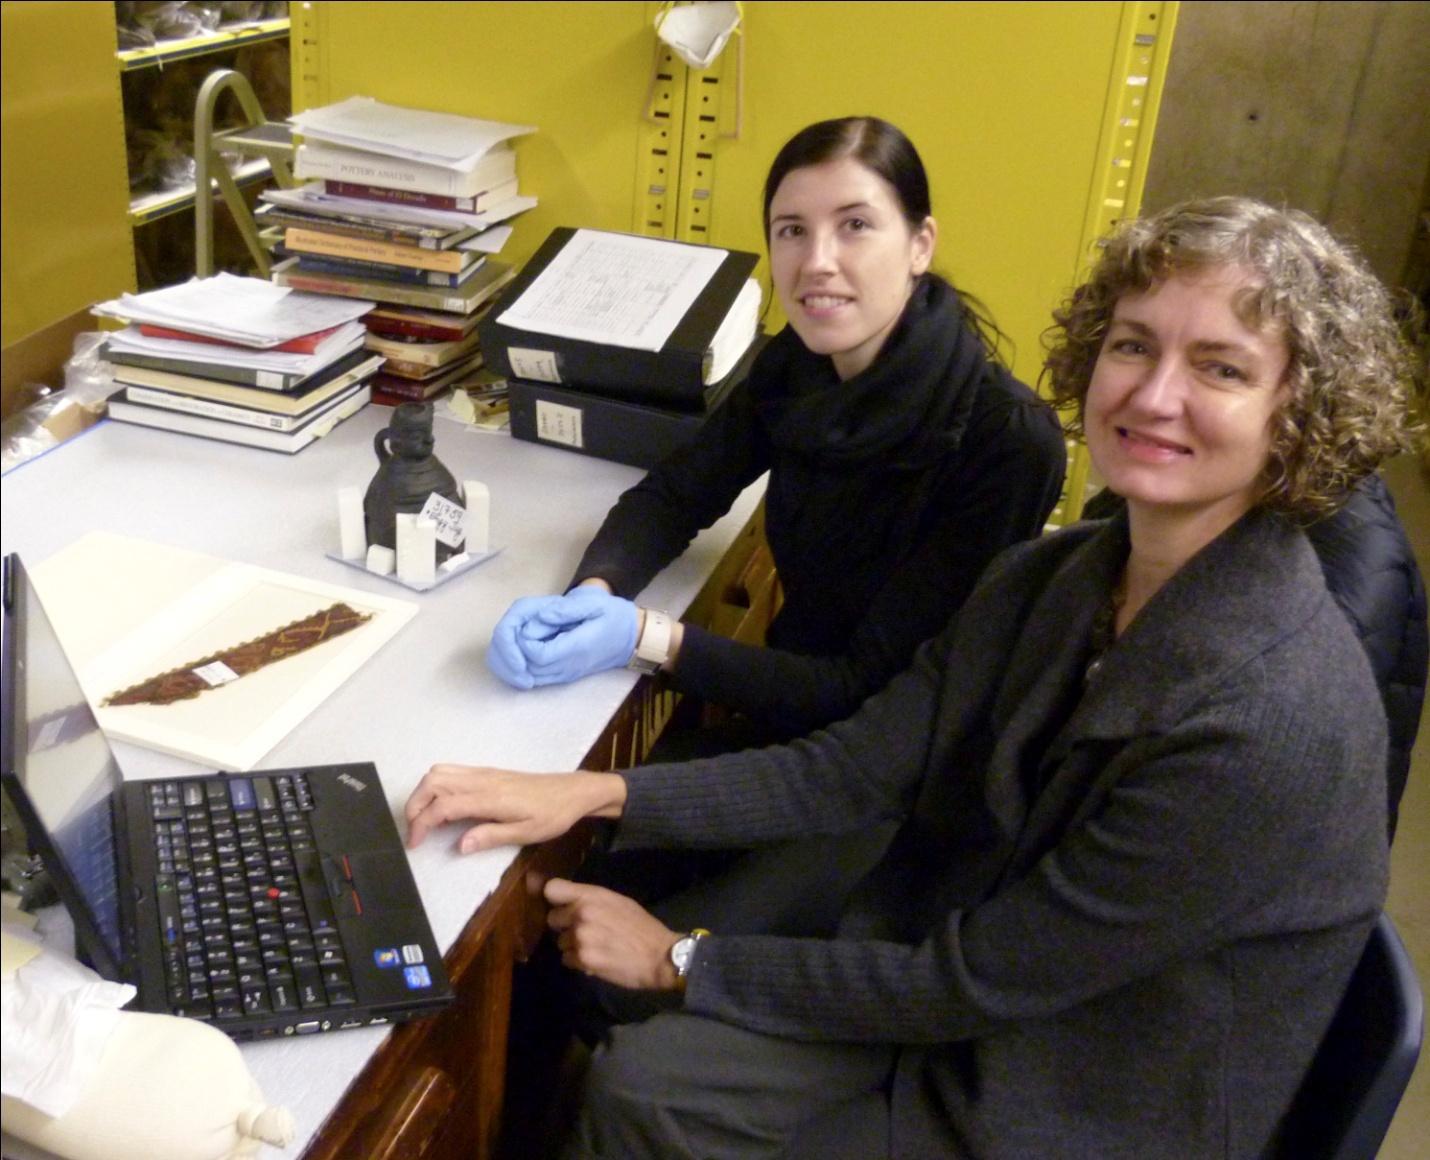 Post-graduate fellows Ainslie Harrison (left) and Fran Baas (right).